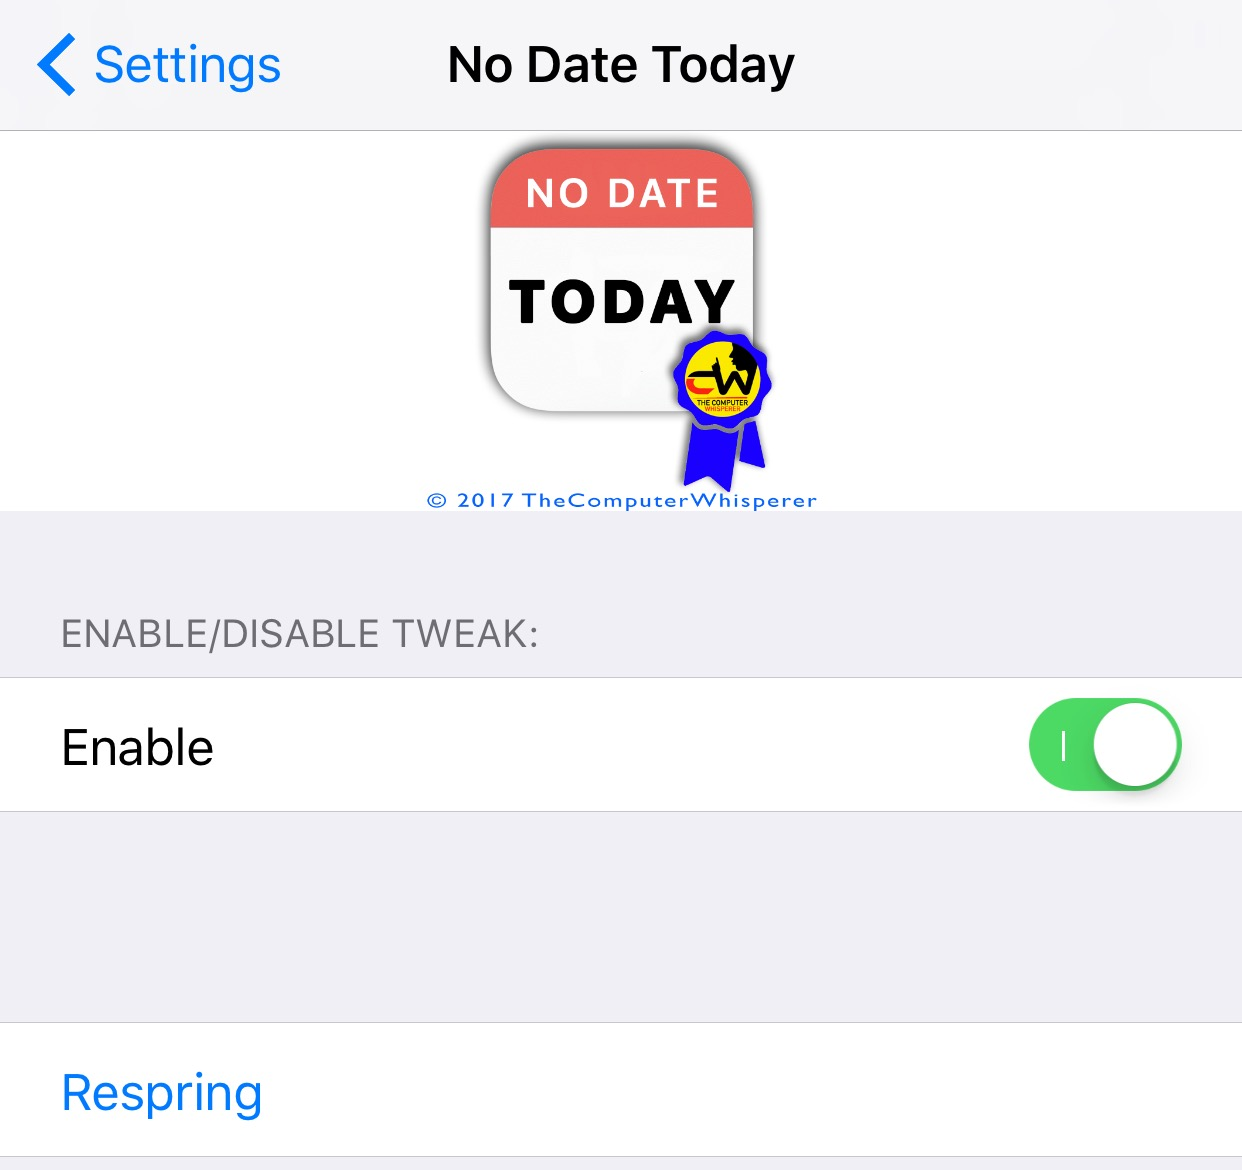 FolderAutoClose 10 automatically closes folders after